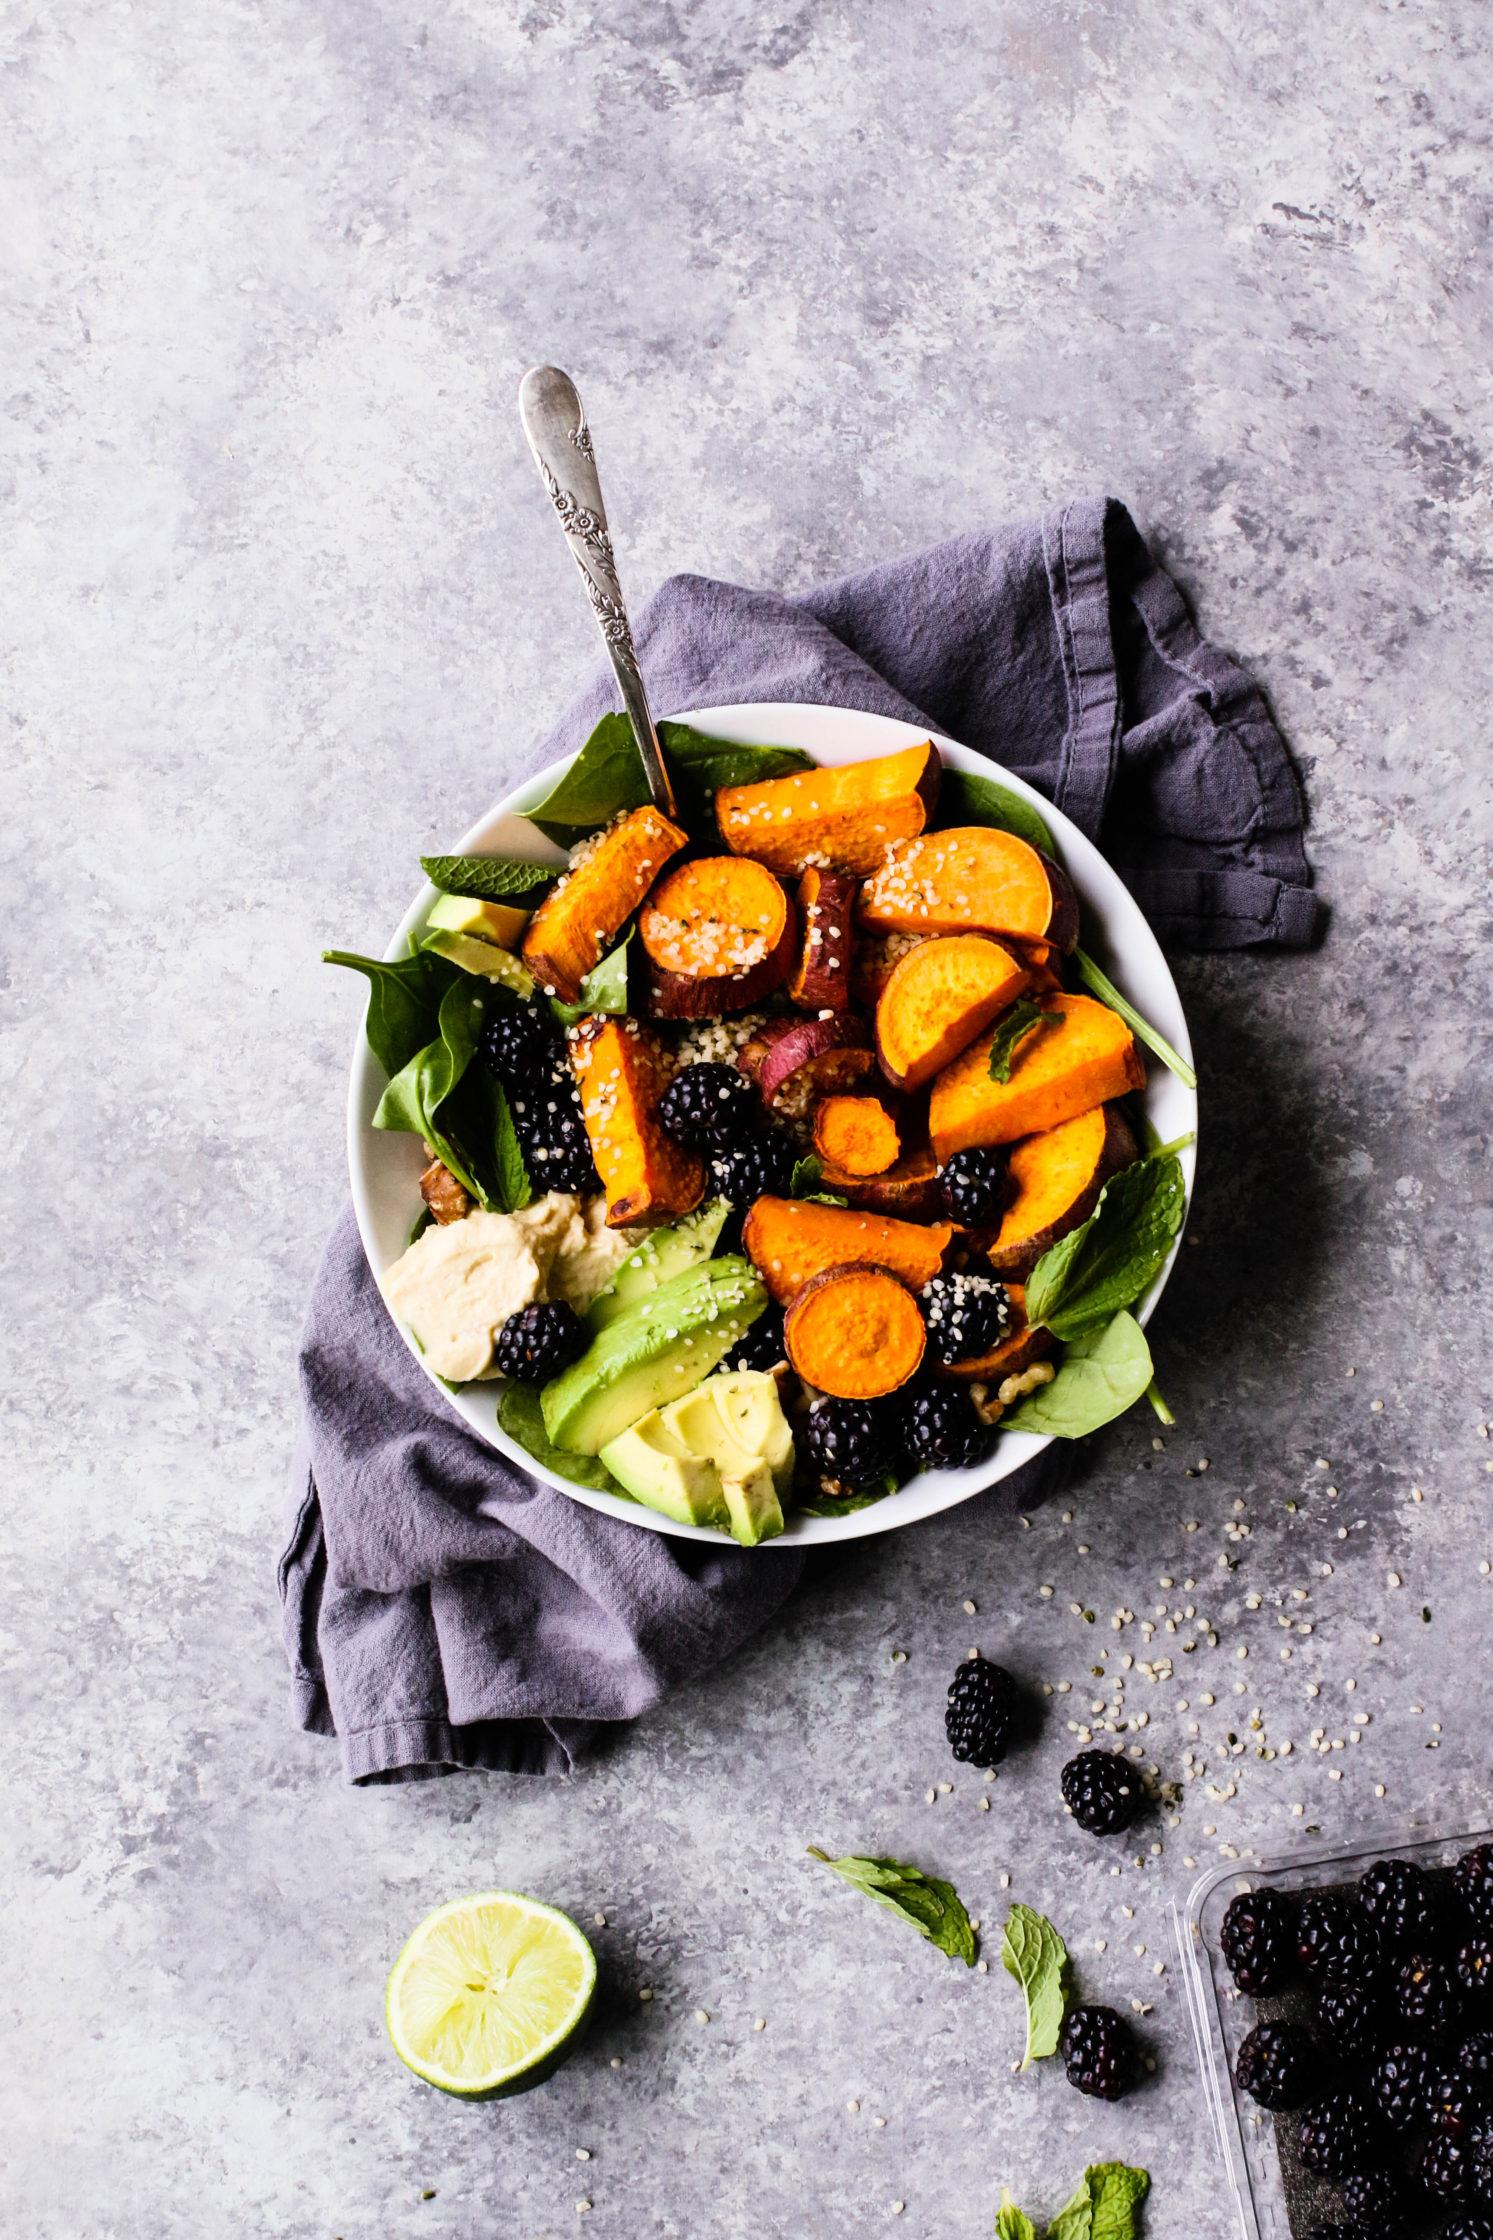 Sweet & Savory Breakfast Salad (V, GF, OF)